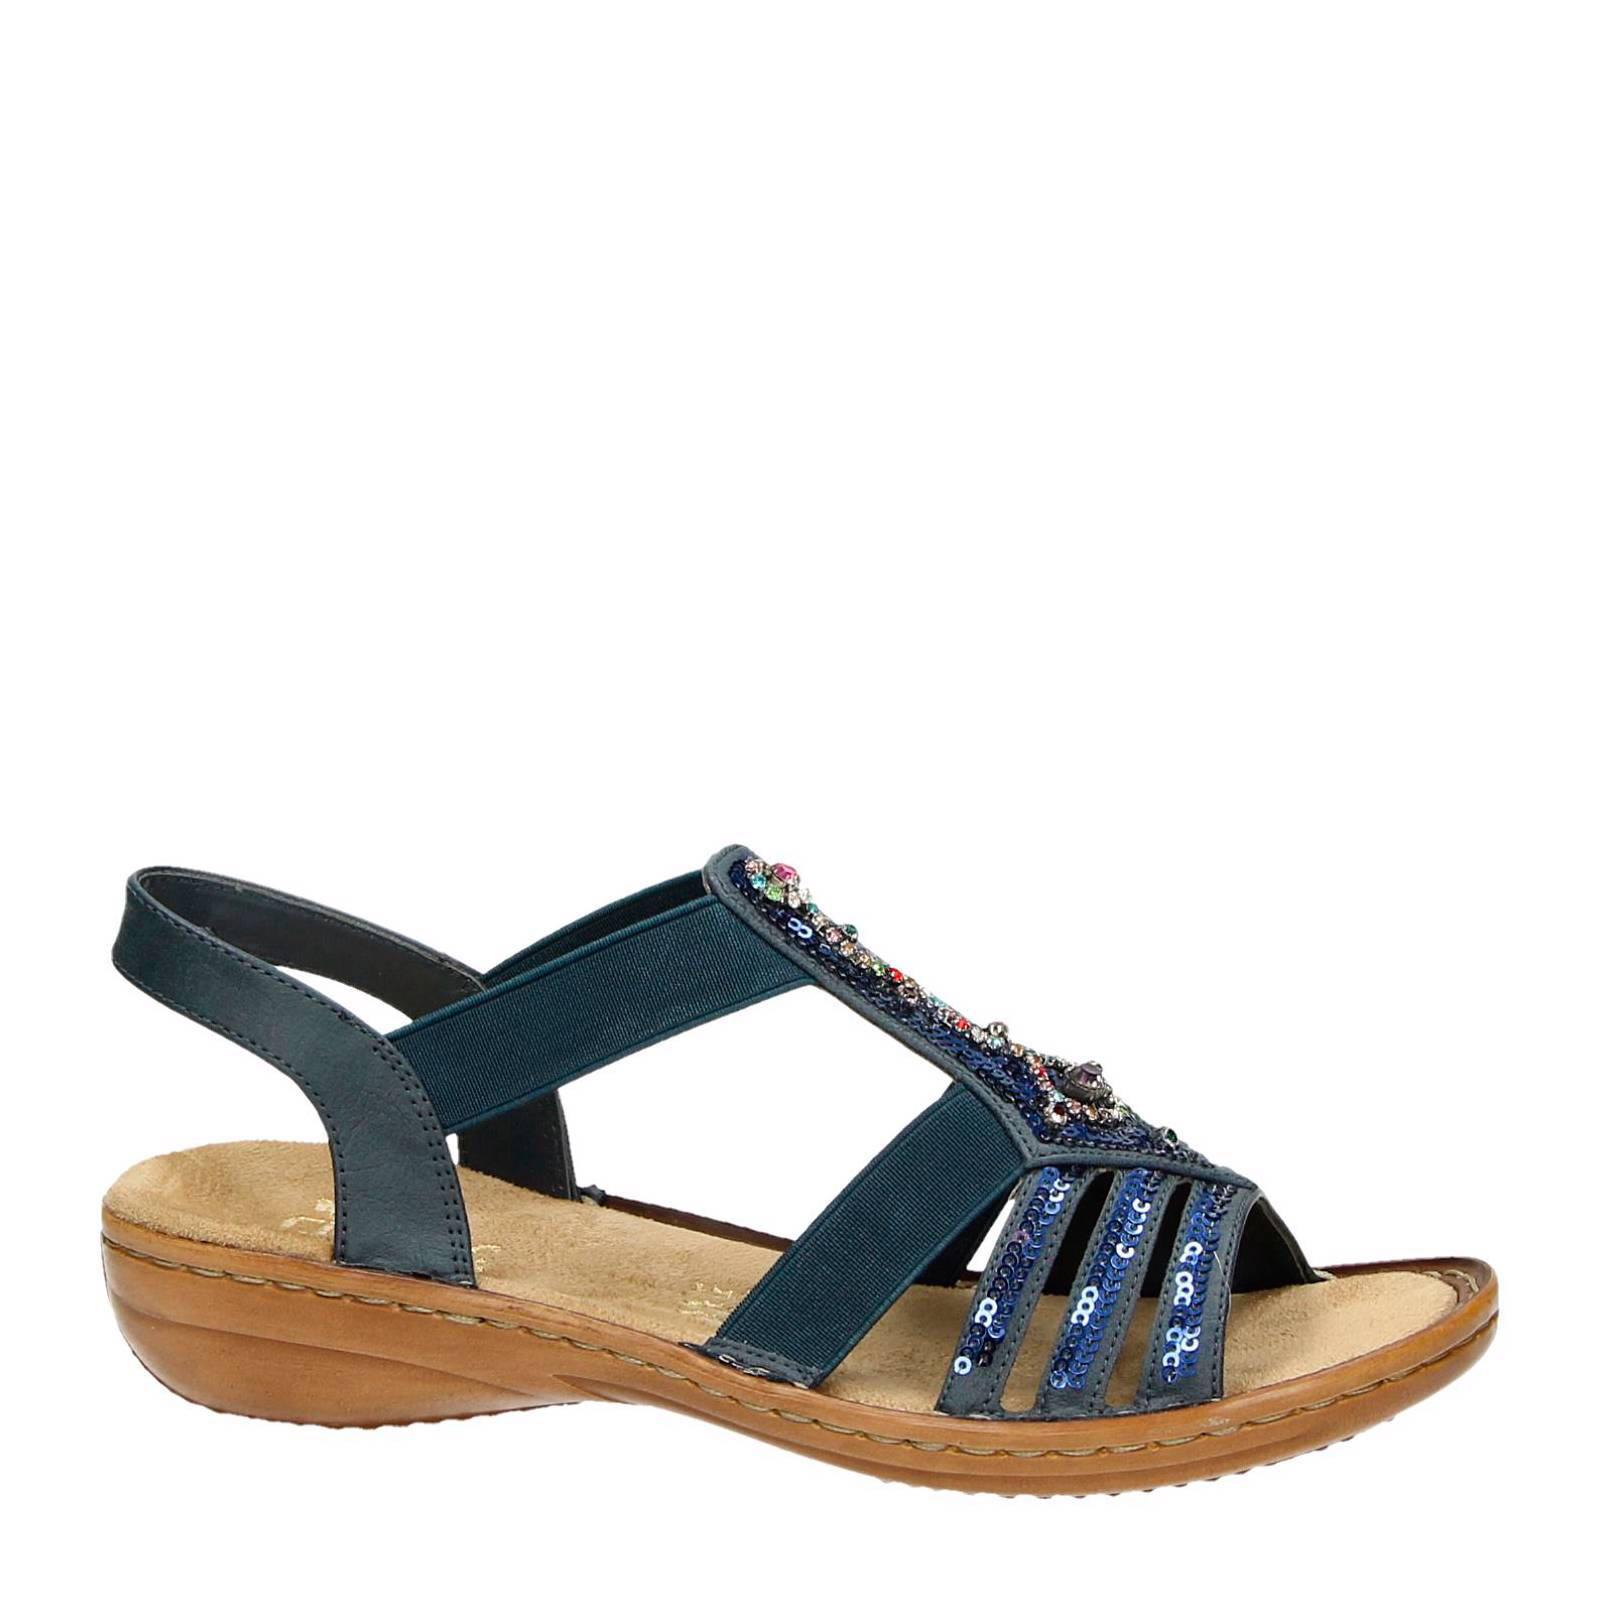 Rieker sandalen | wehkamp